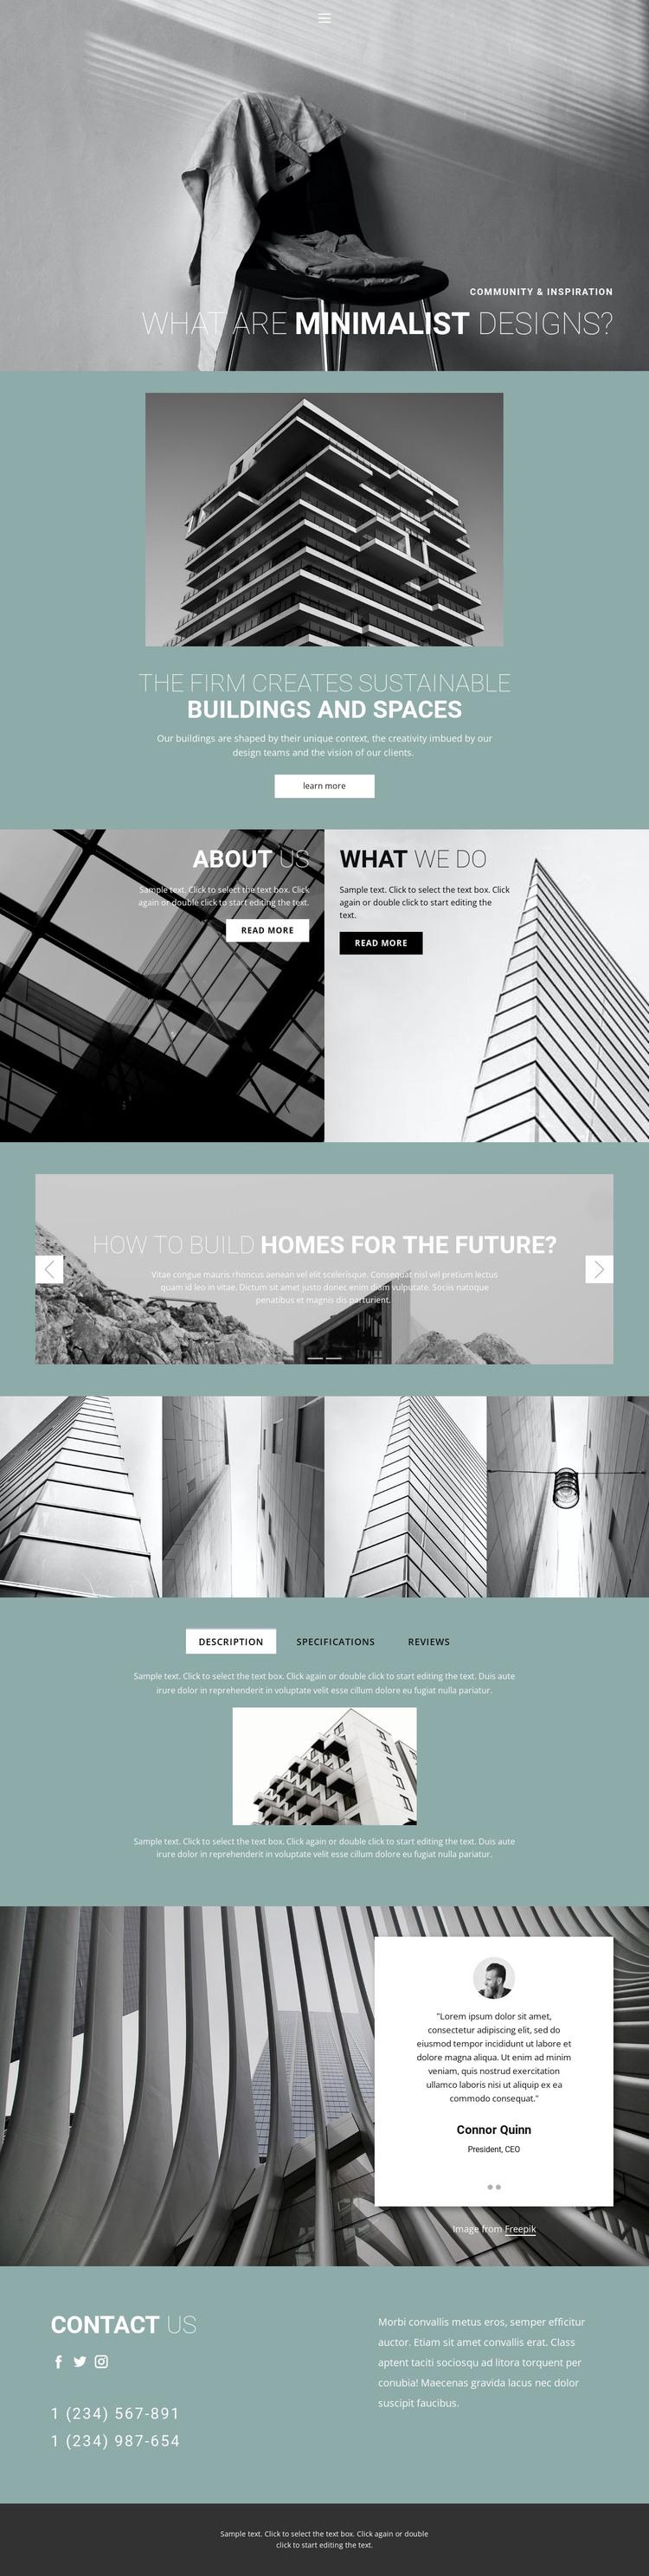 Perfect architecture ideas WordPress Theme